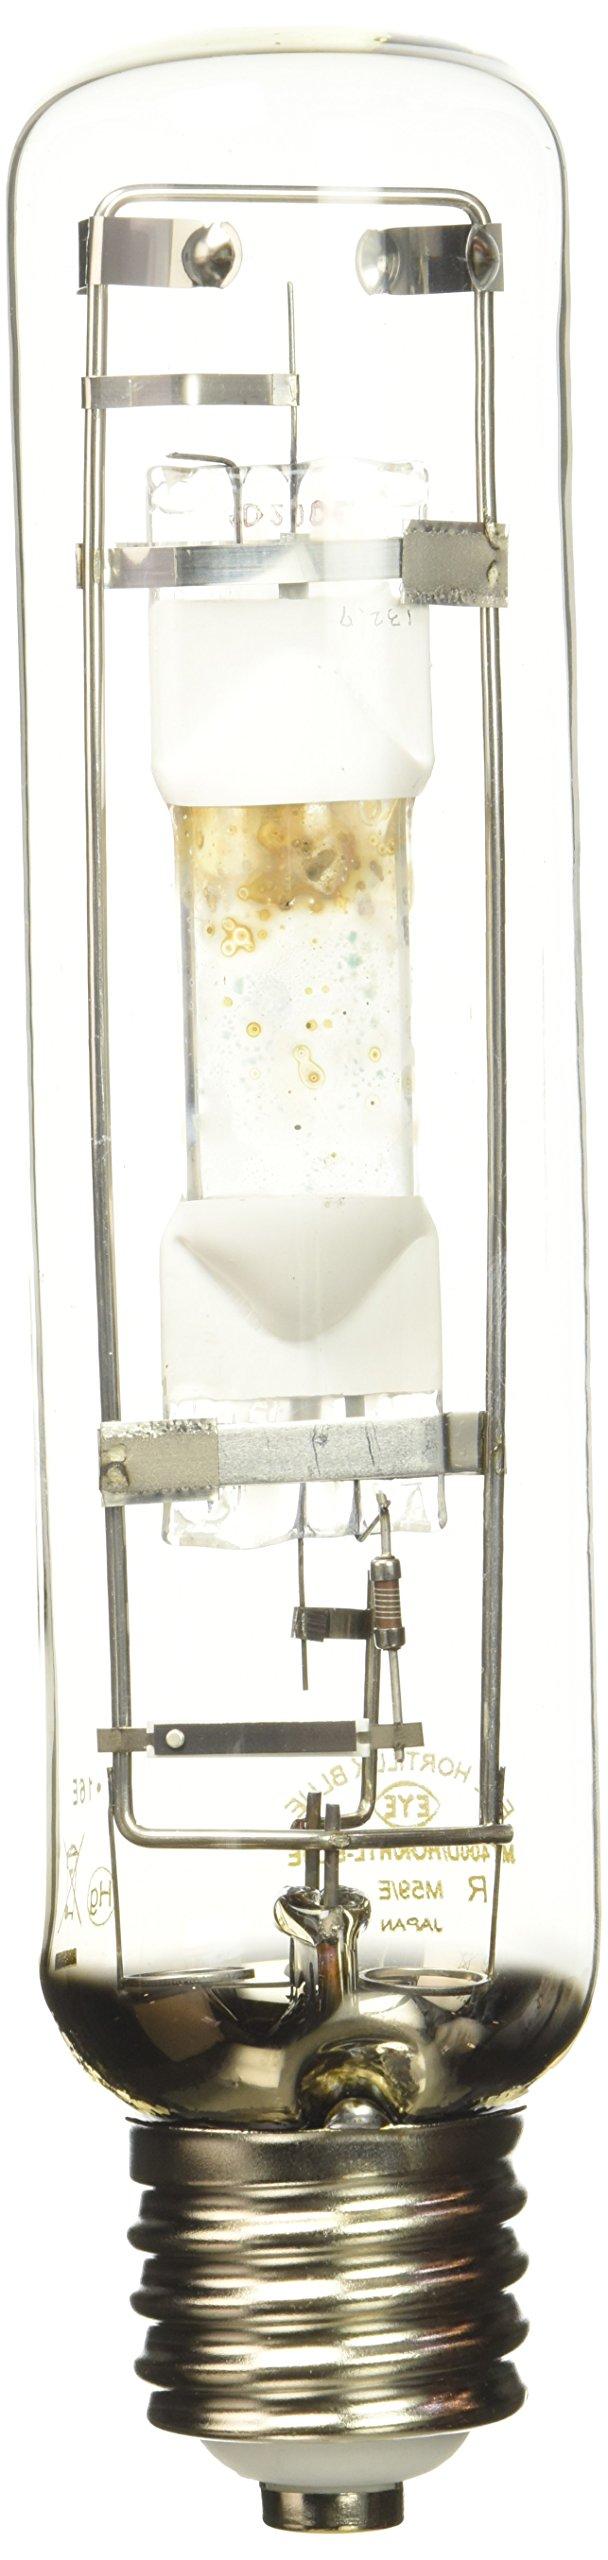 Hortilux Eye Daylight Blue Metal Halide MH Plant Grow Light Lamp Bulb E-Ballast Compatible, 400W